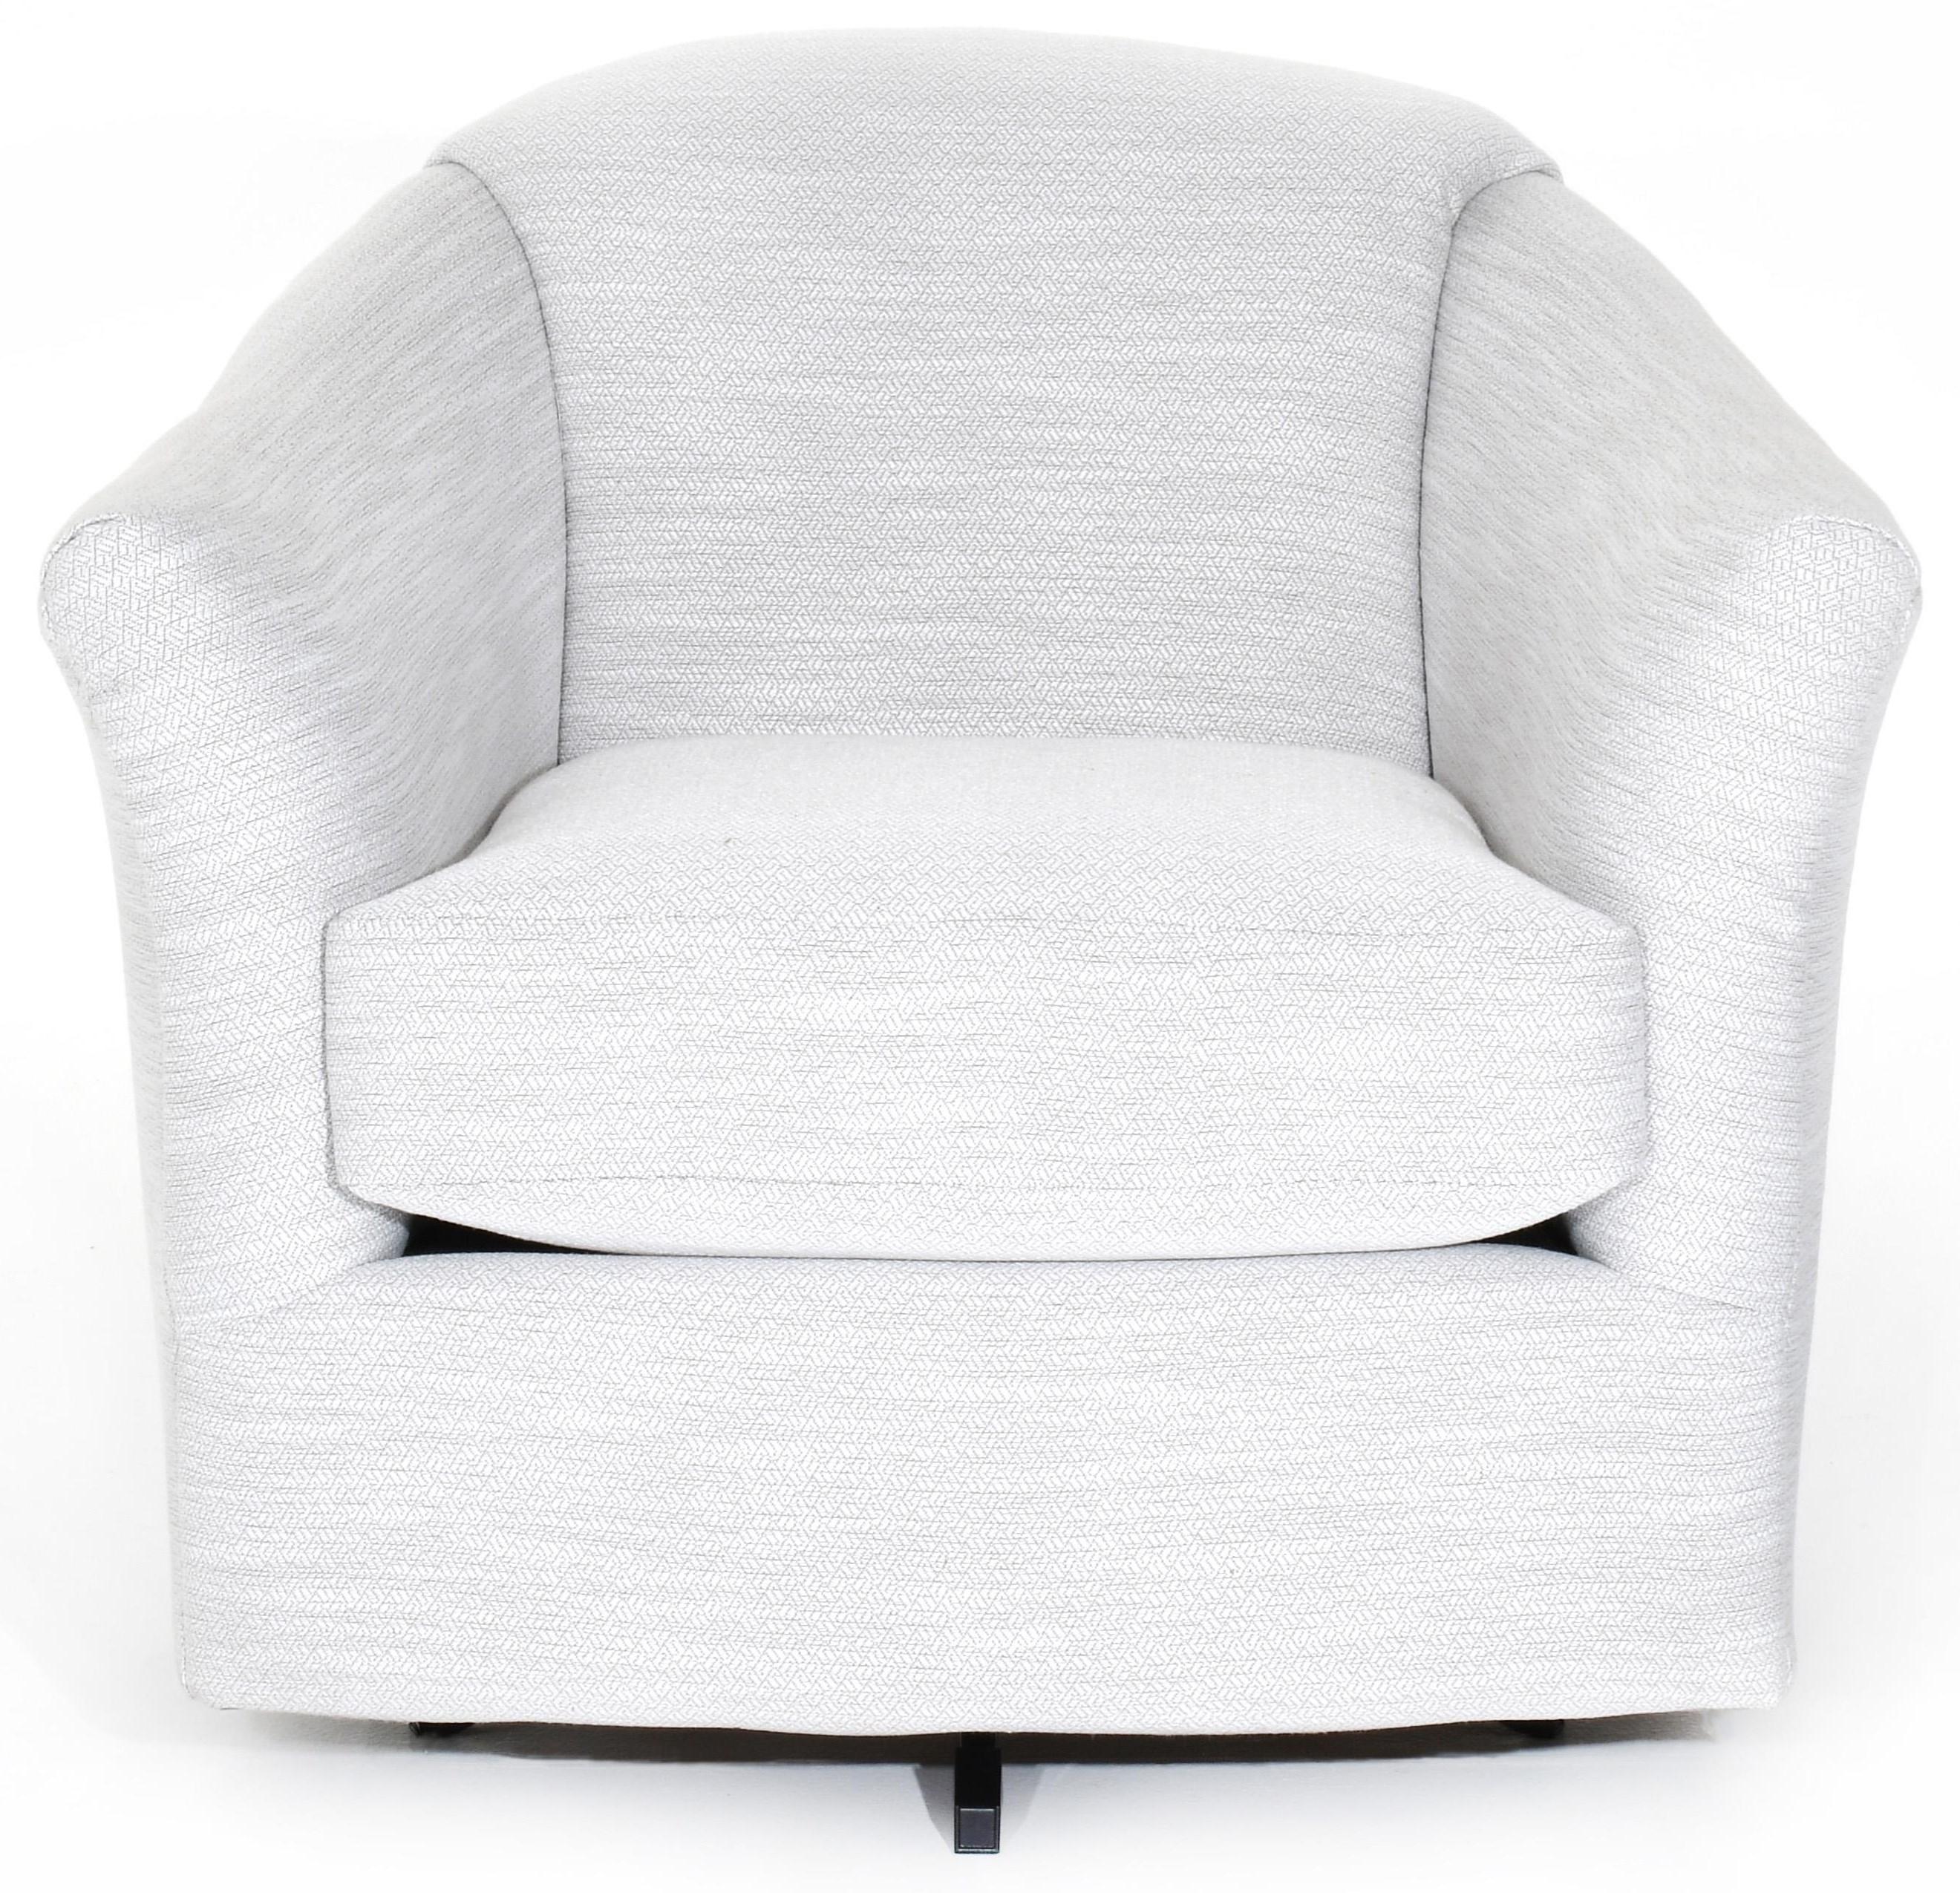 Best Home Furnishings Swivel Glide ChairsSwivel Chair ...